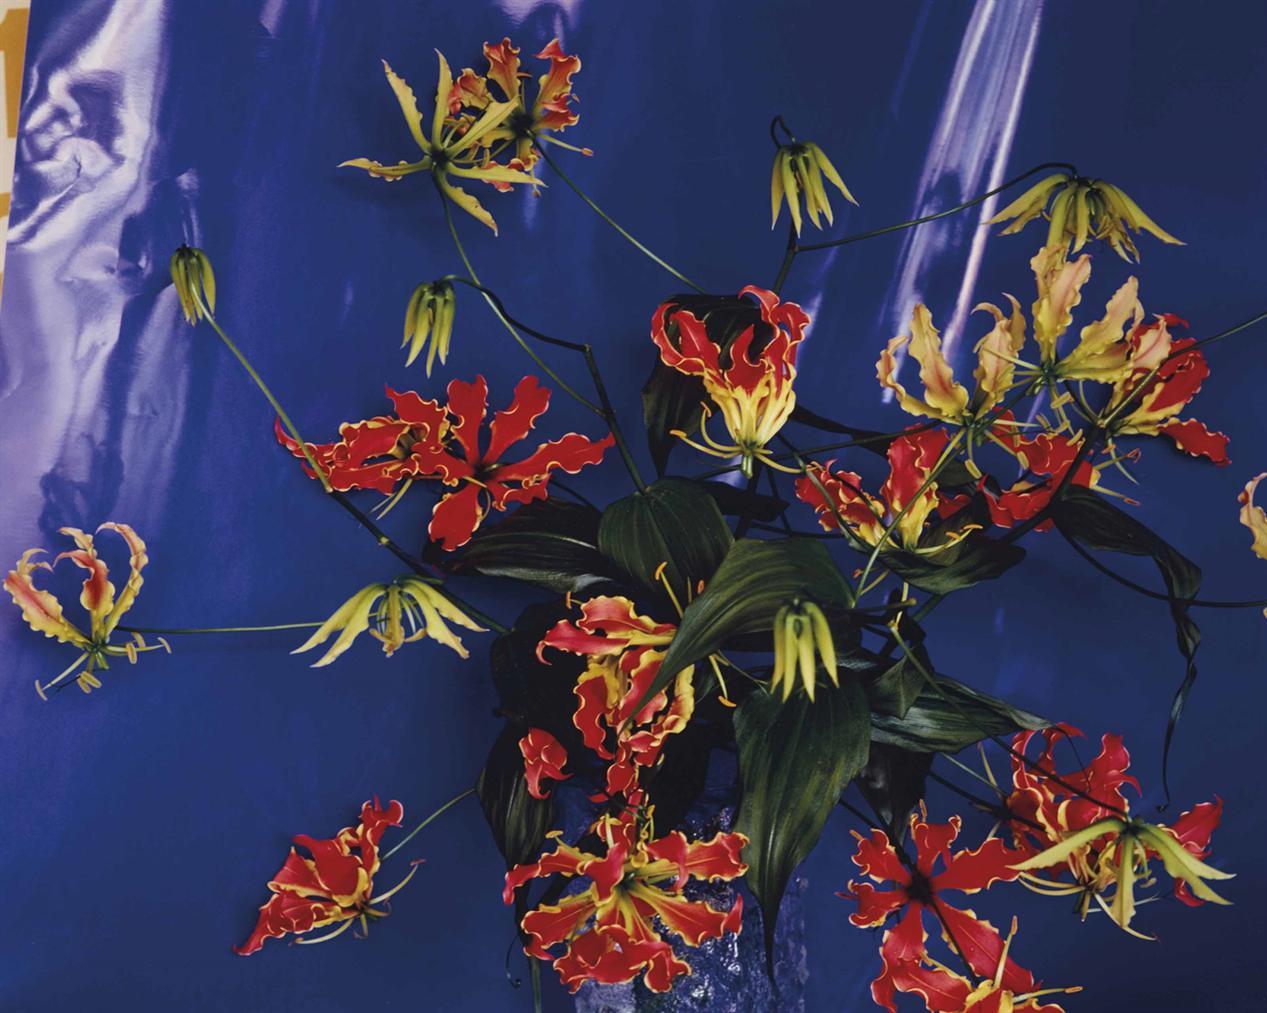 Nobuyoshi Araki-From Flower-1997